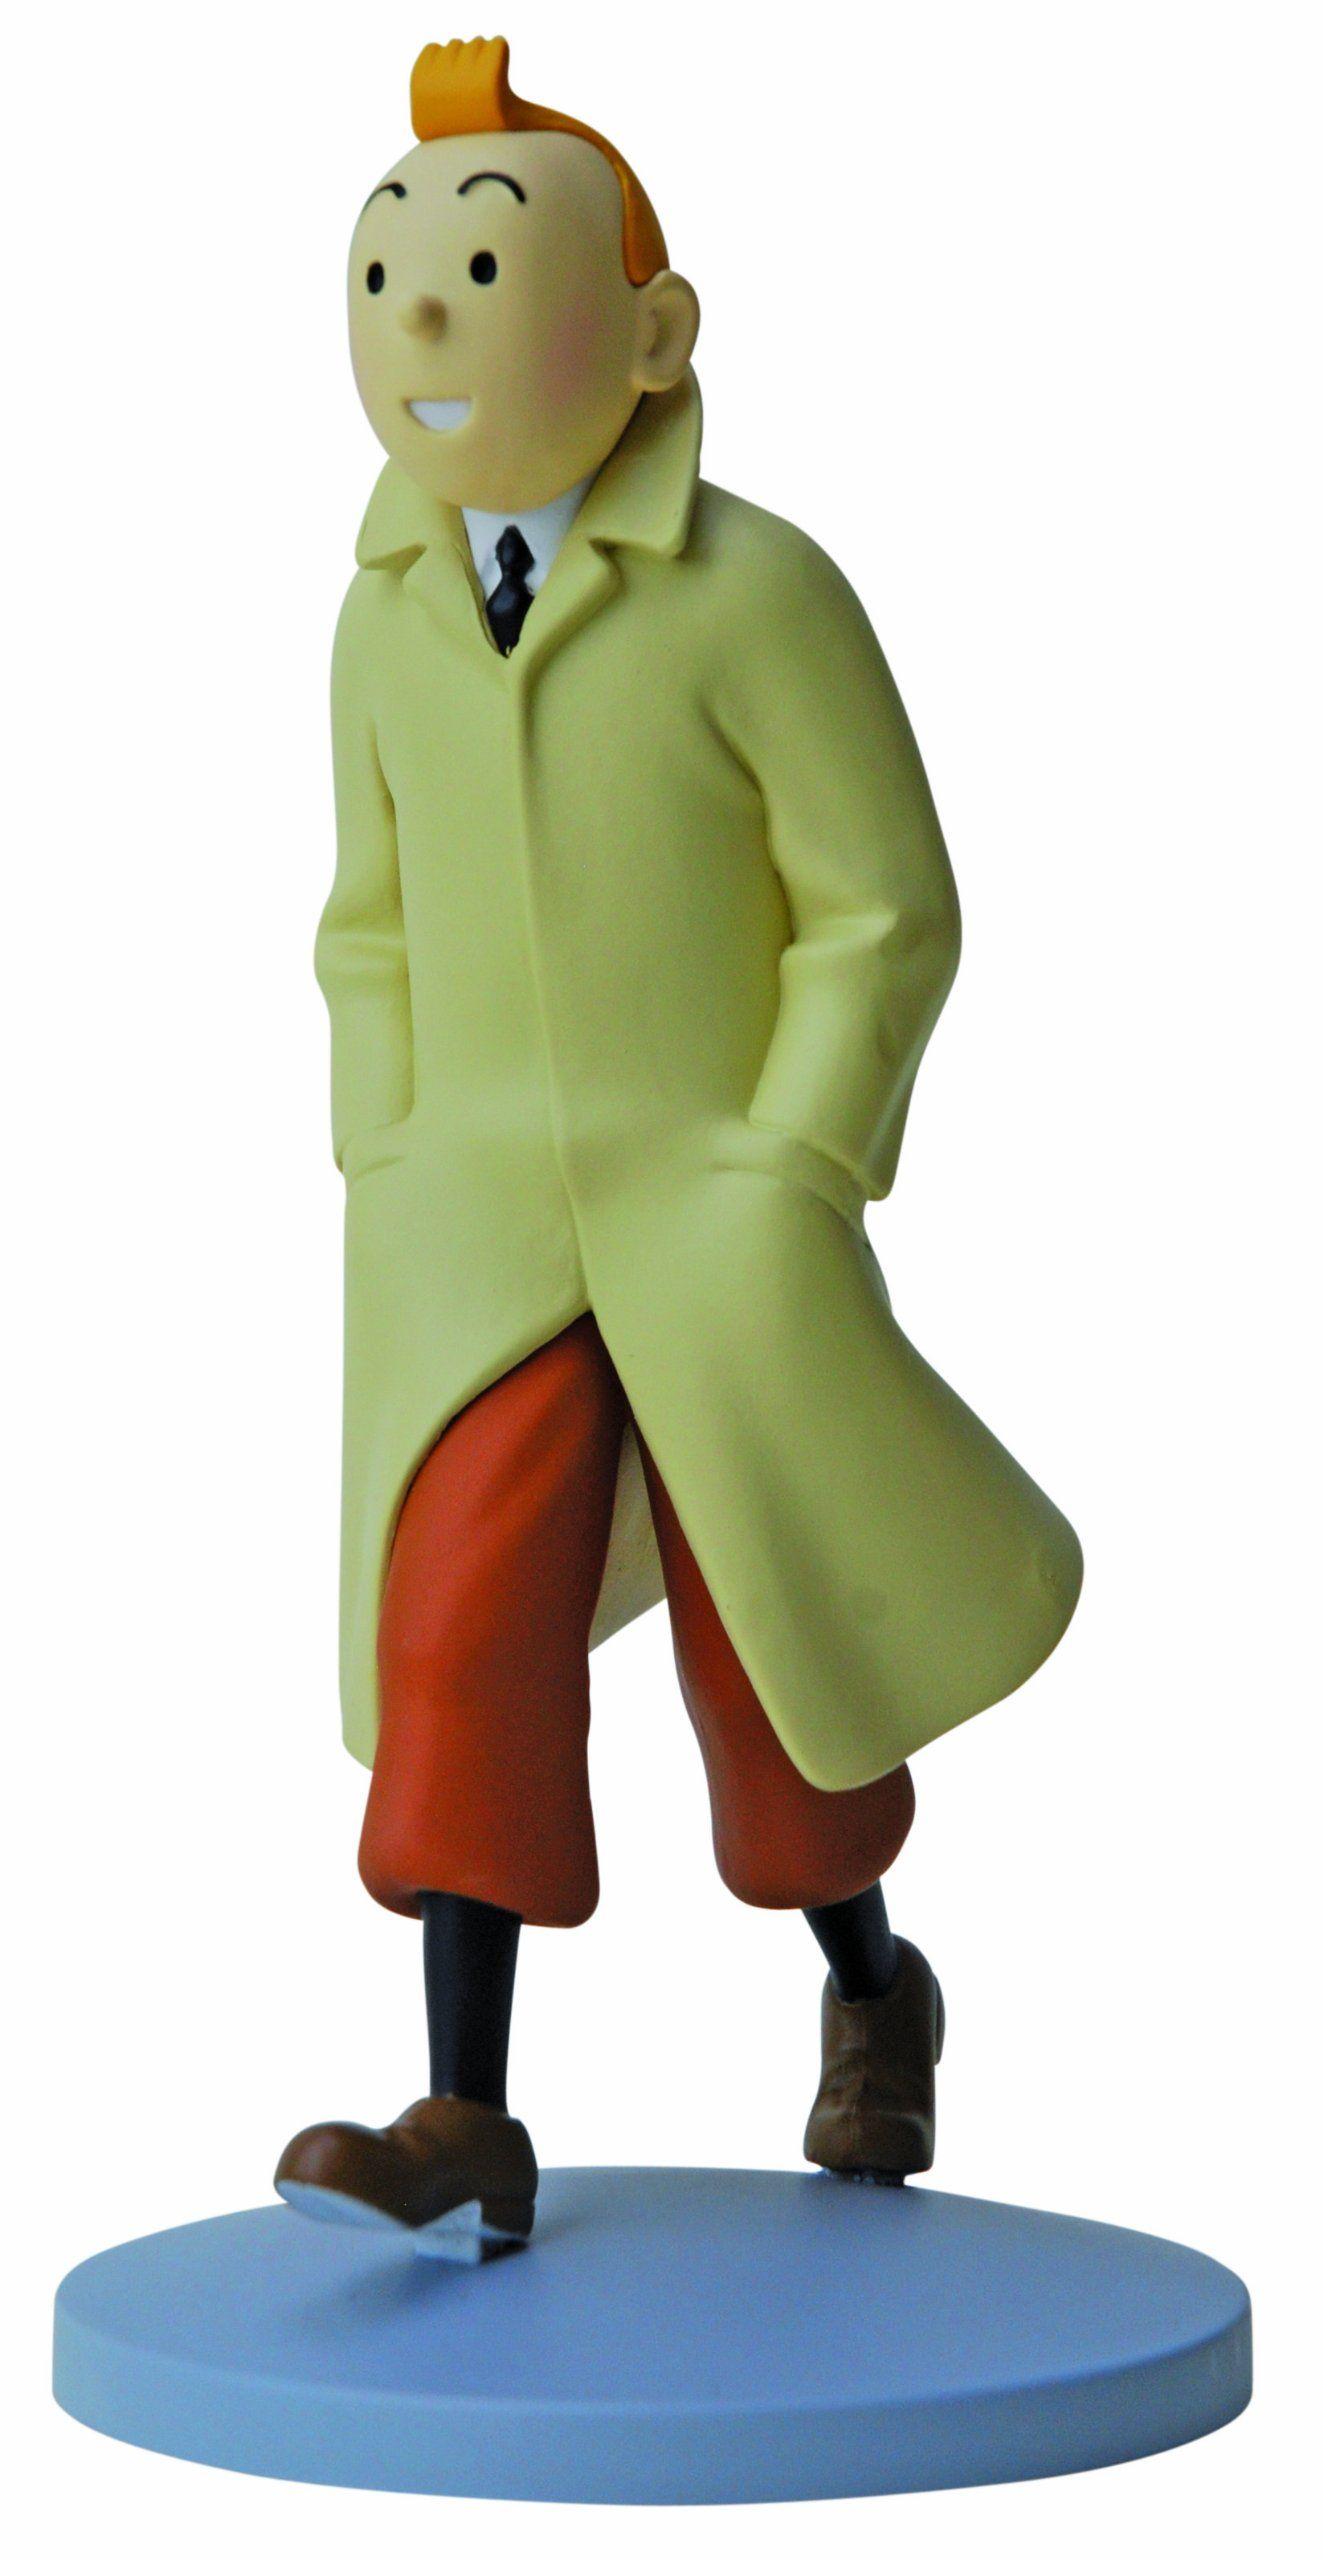 Tintin Figurines Officielle # 1 Tintin in Coat Herge model Moulinsart Figure